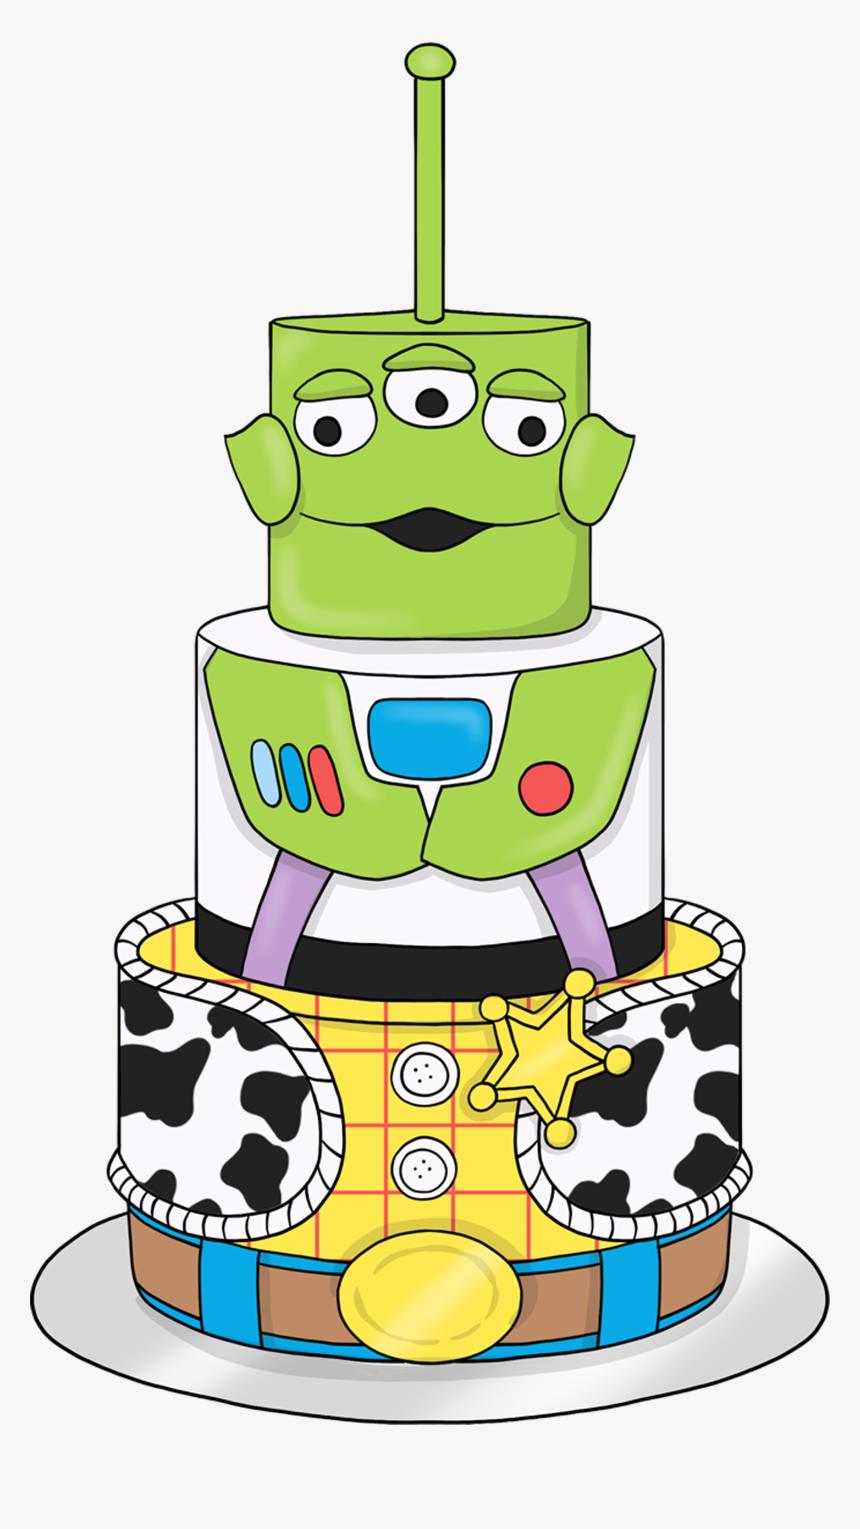 Incredible Toystory Birthdaycake Alien Buzzlightyear Woody Cartoon Hd Funny Birthday Cards Online Inifofree Goldxyz